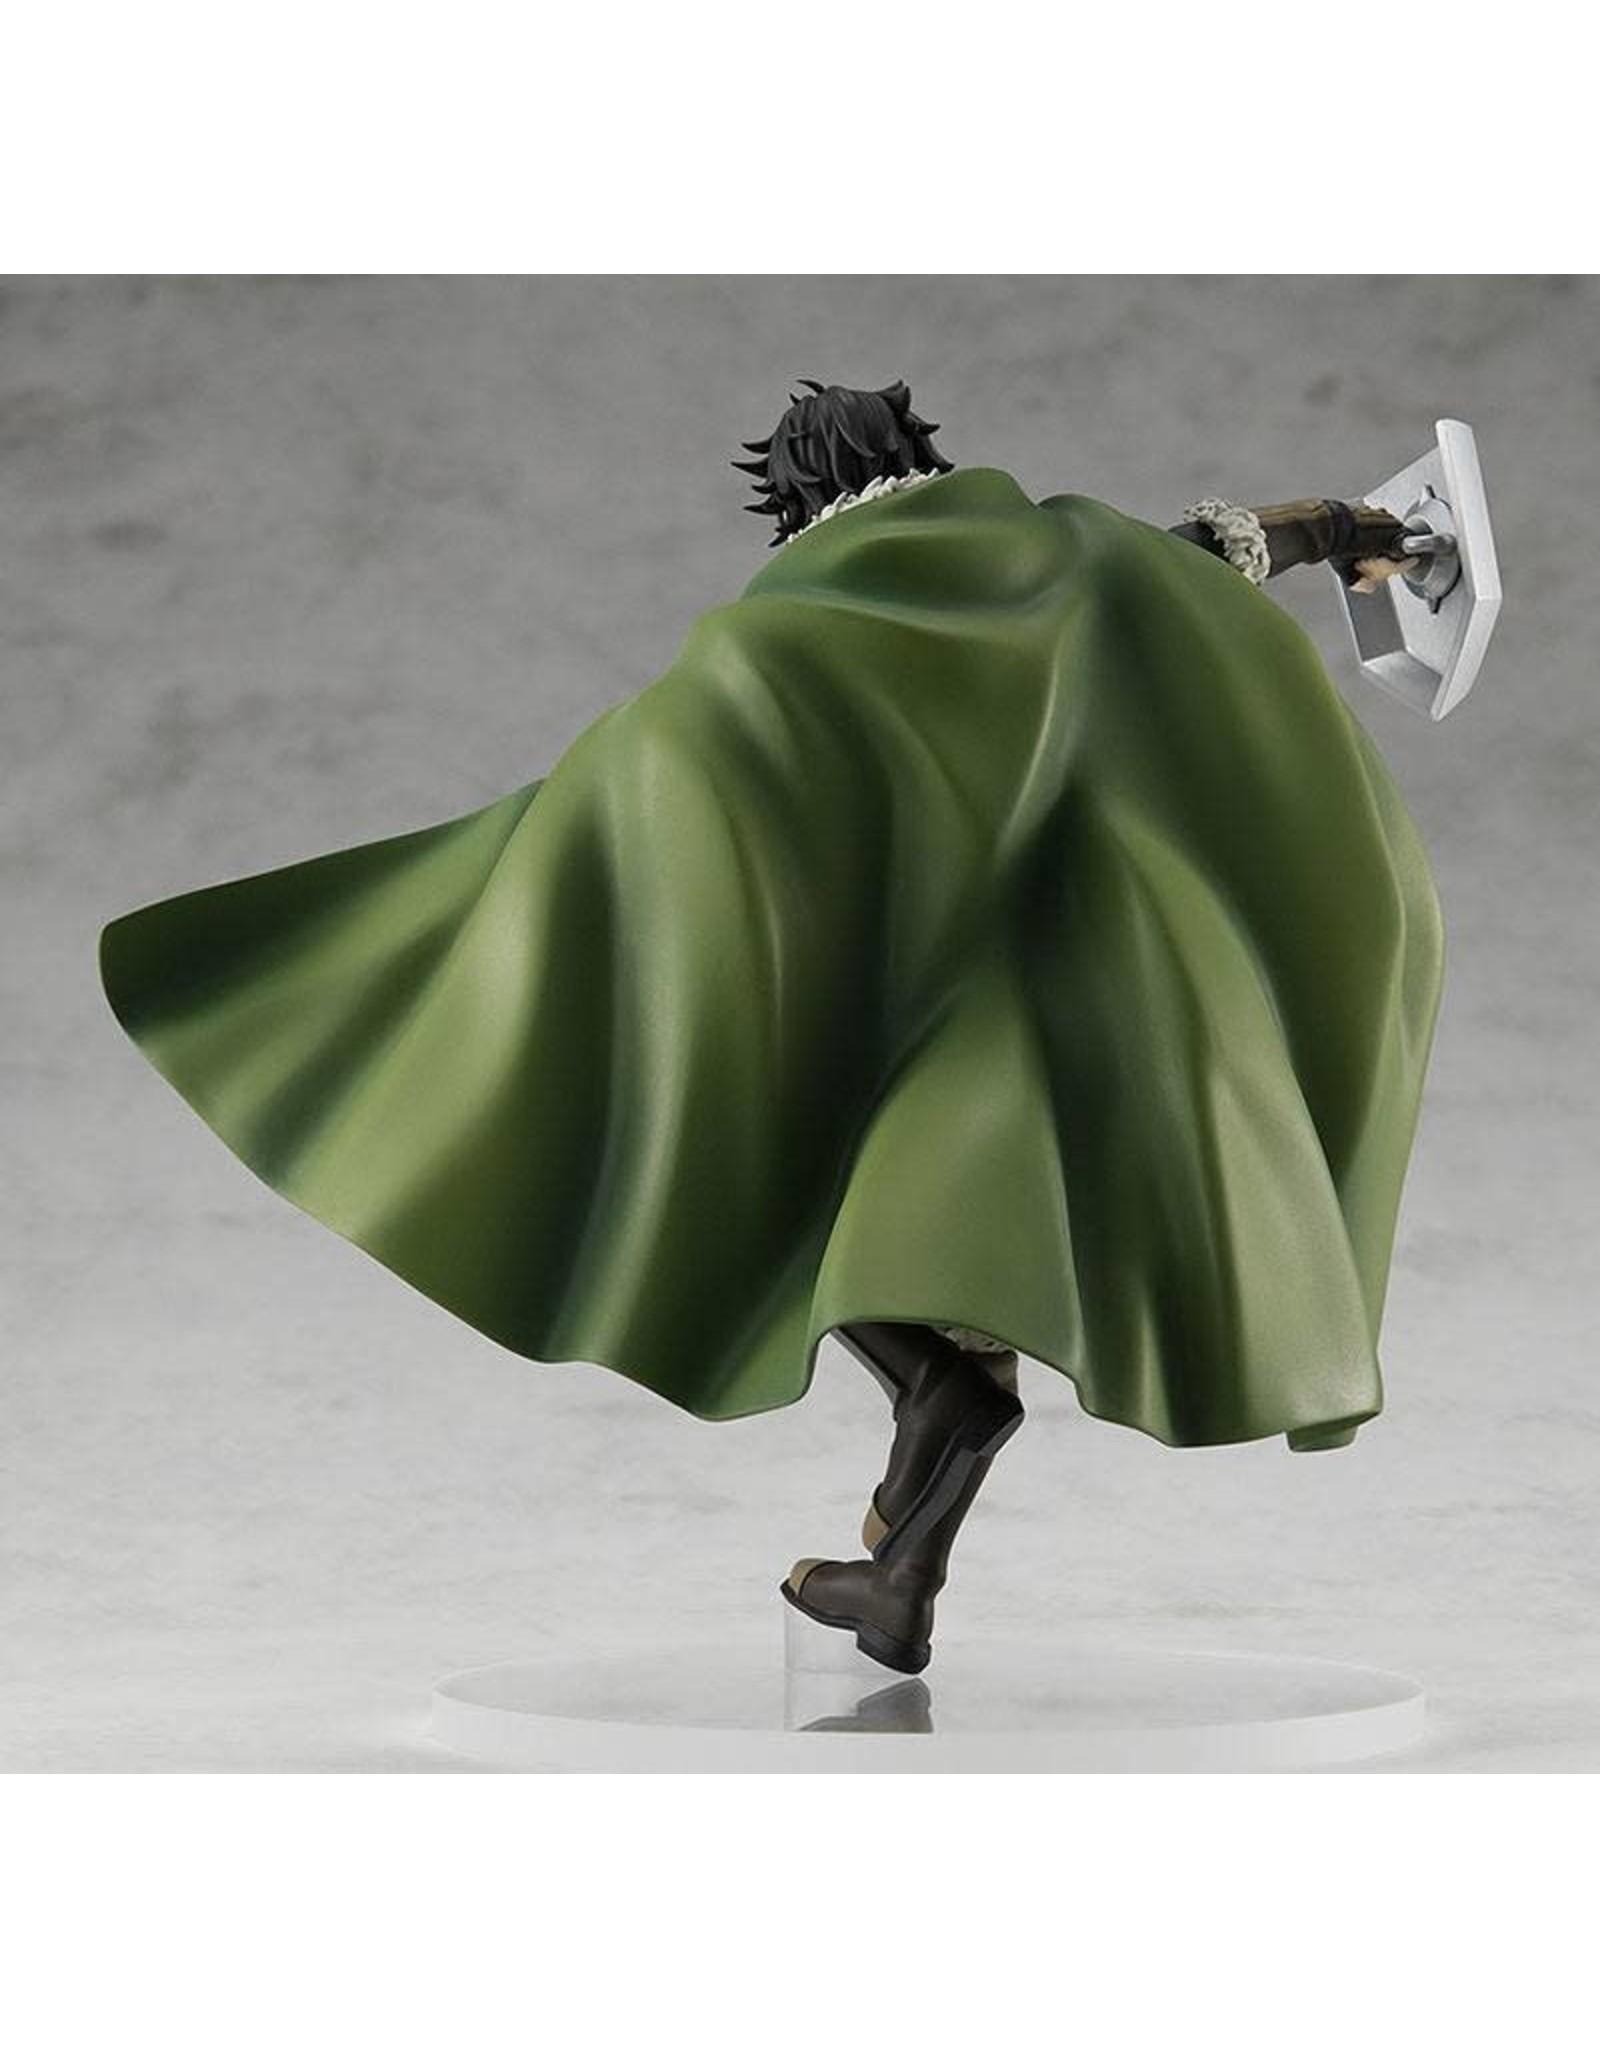 The Rising of the Shield Hero: Season 2 - Naofumi Iwatani - Pop Up Parade PVC Statue - 17 cm